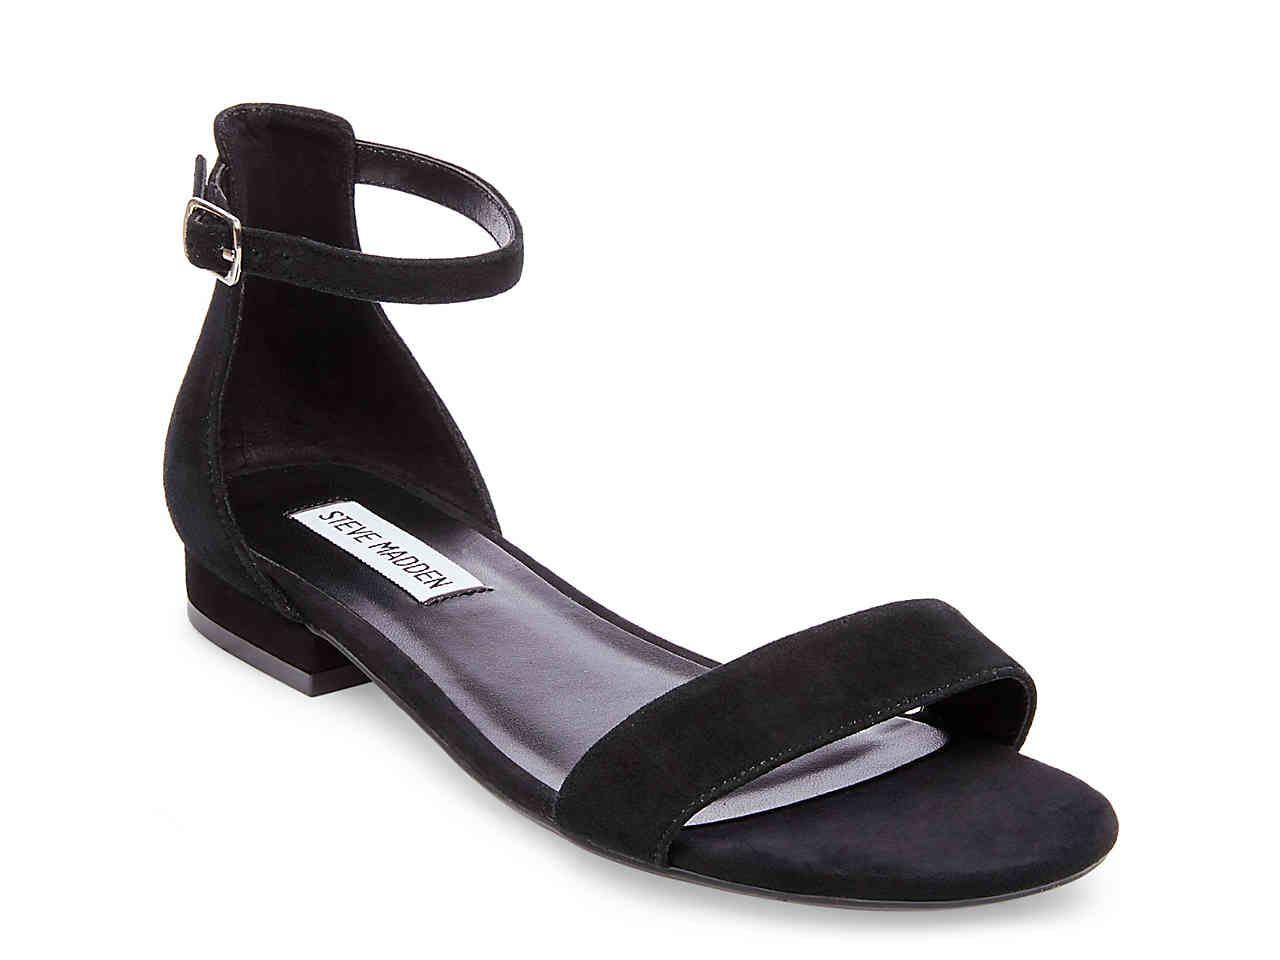 Steve Madden Lamp Flat Sandal Prom Shoes Black Classy Sandals Black Dress Sandals [ 960 x 1280 Pixel ]